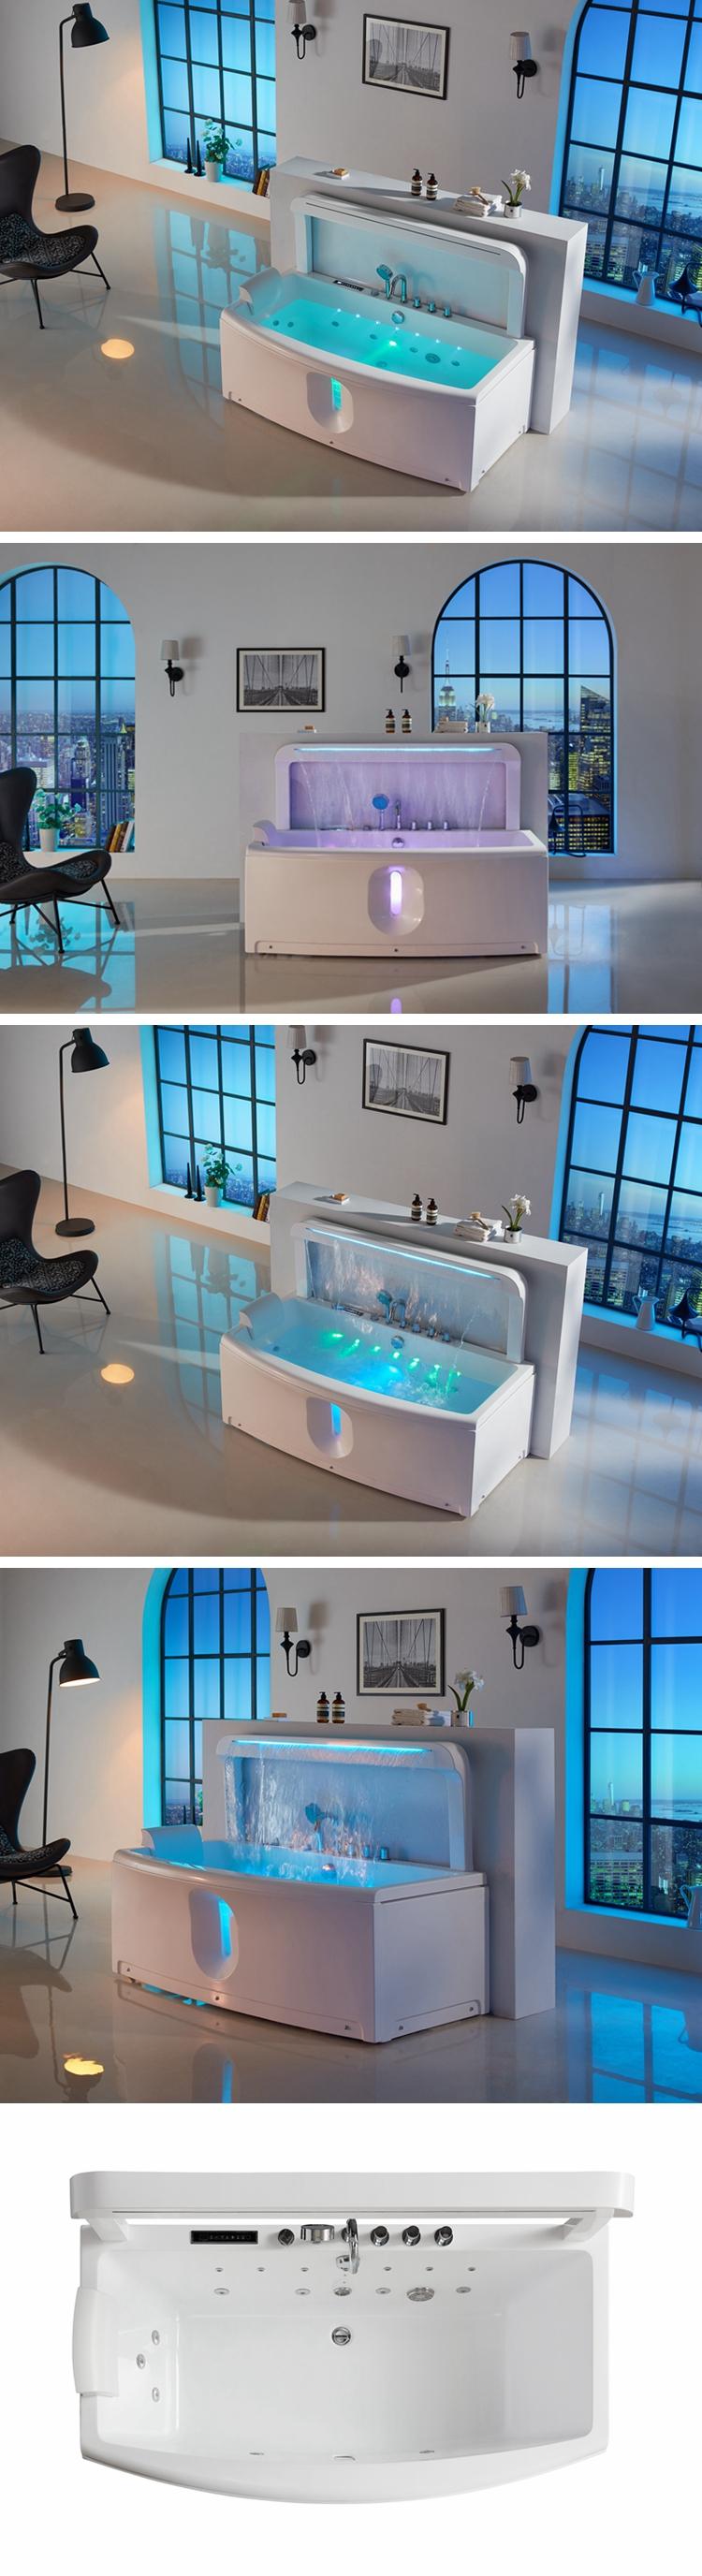 waterfall acrylic whirlpool massage bathtub bath tub whirlpool